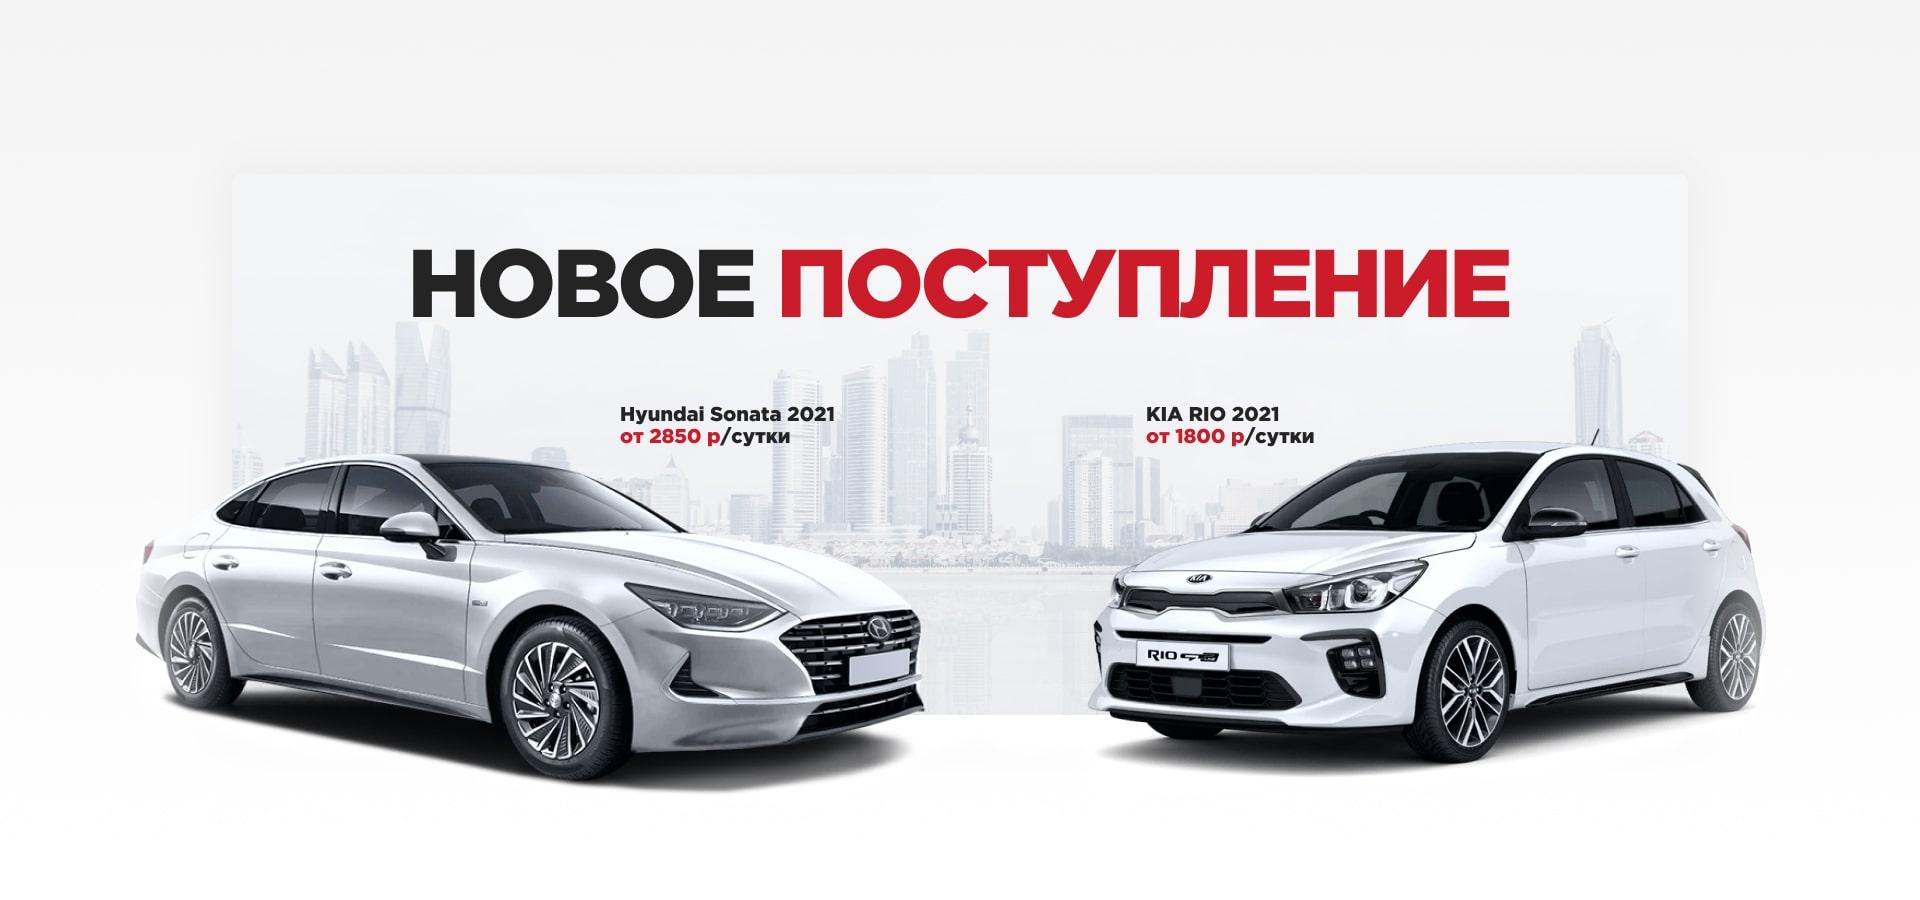 аренда авто краснодар без водителя рейтинг